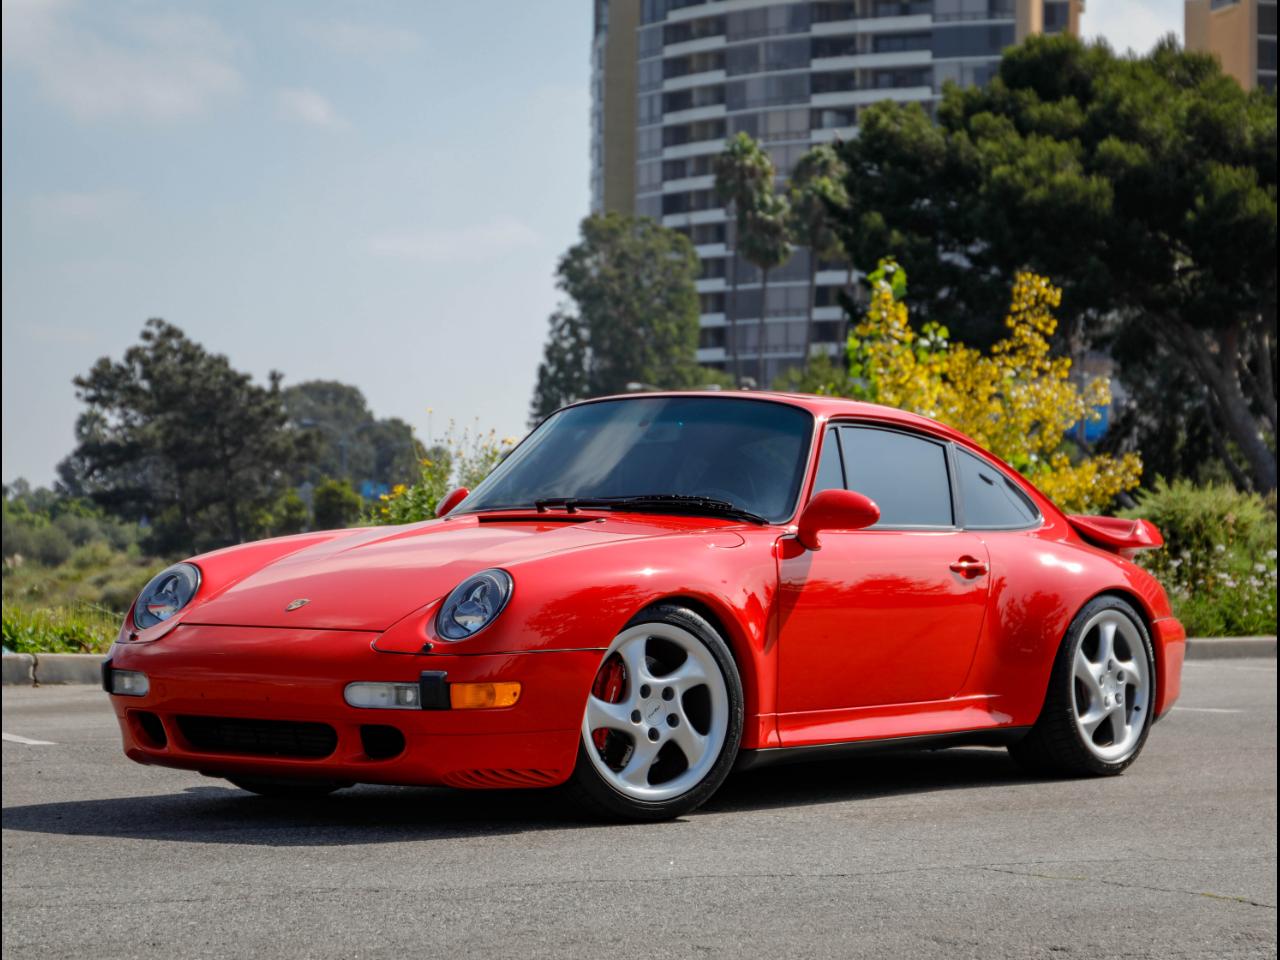 1997 Porsche 911 Turbo 993 Coupe